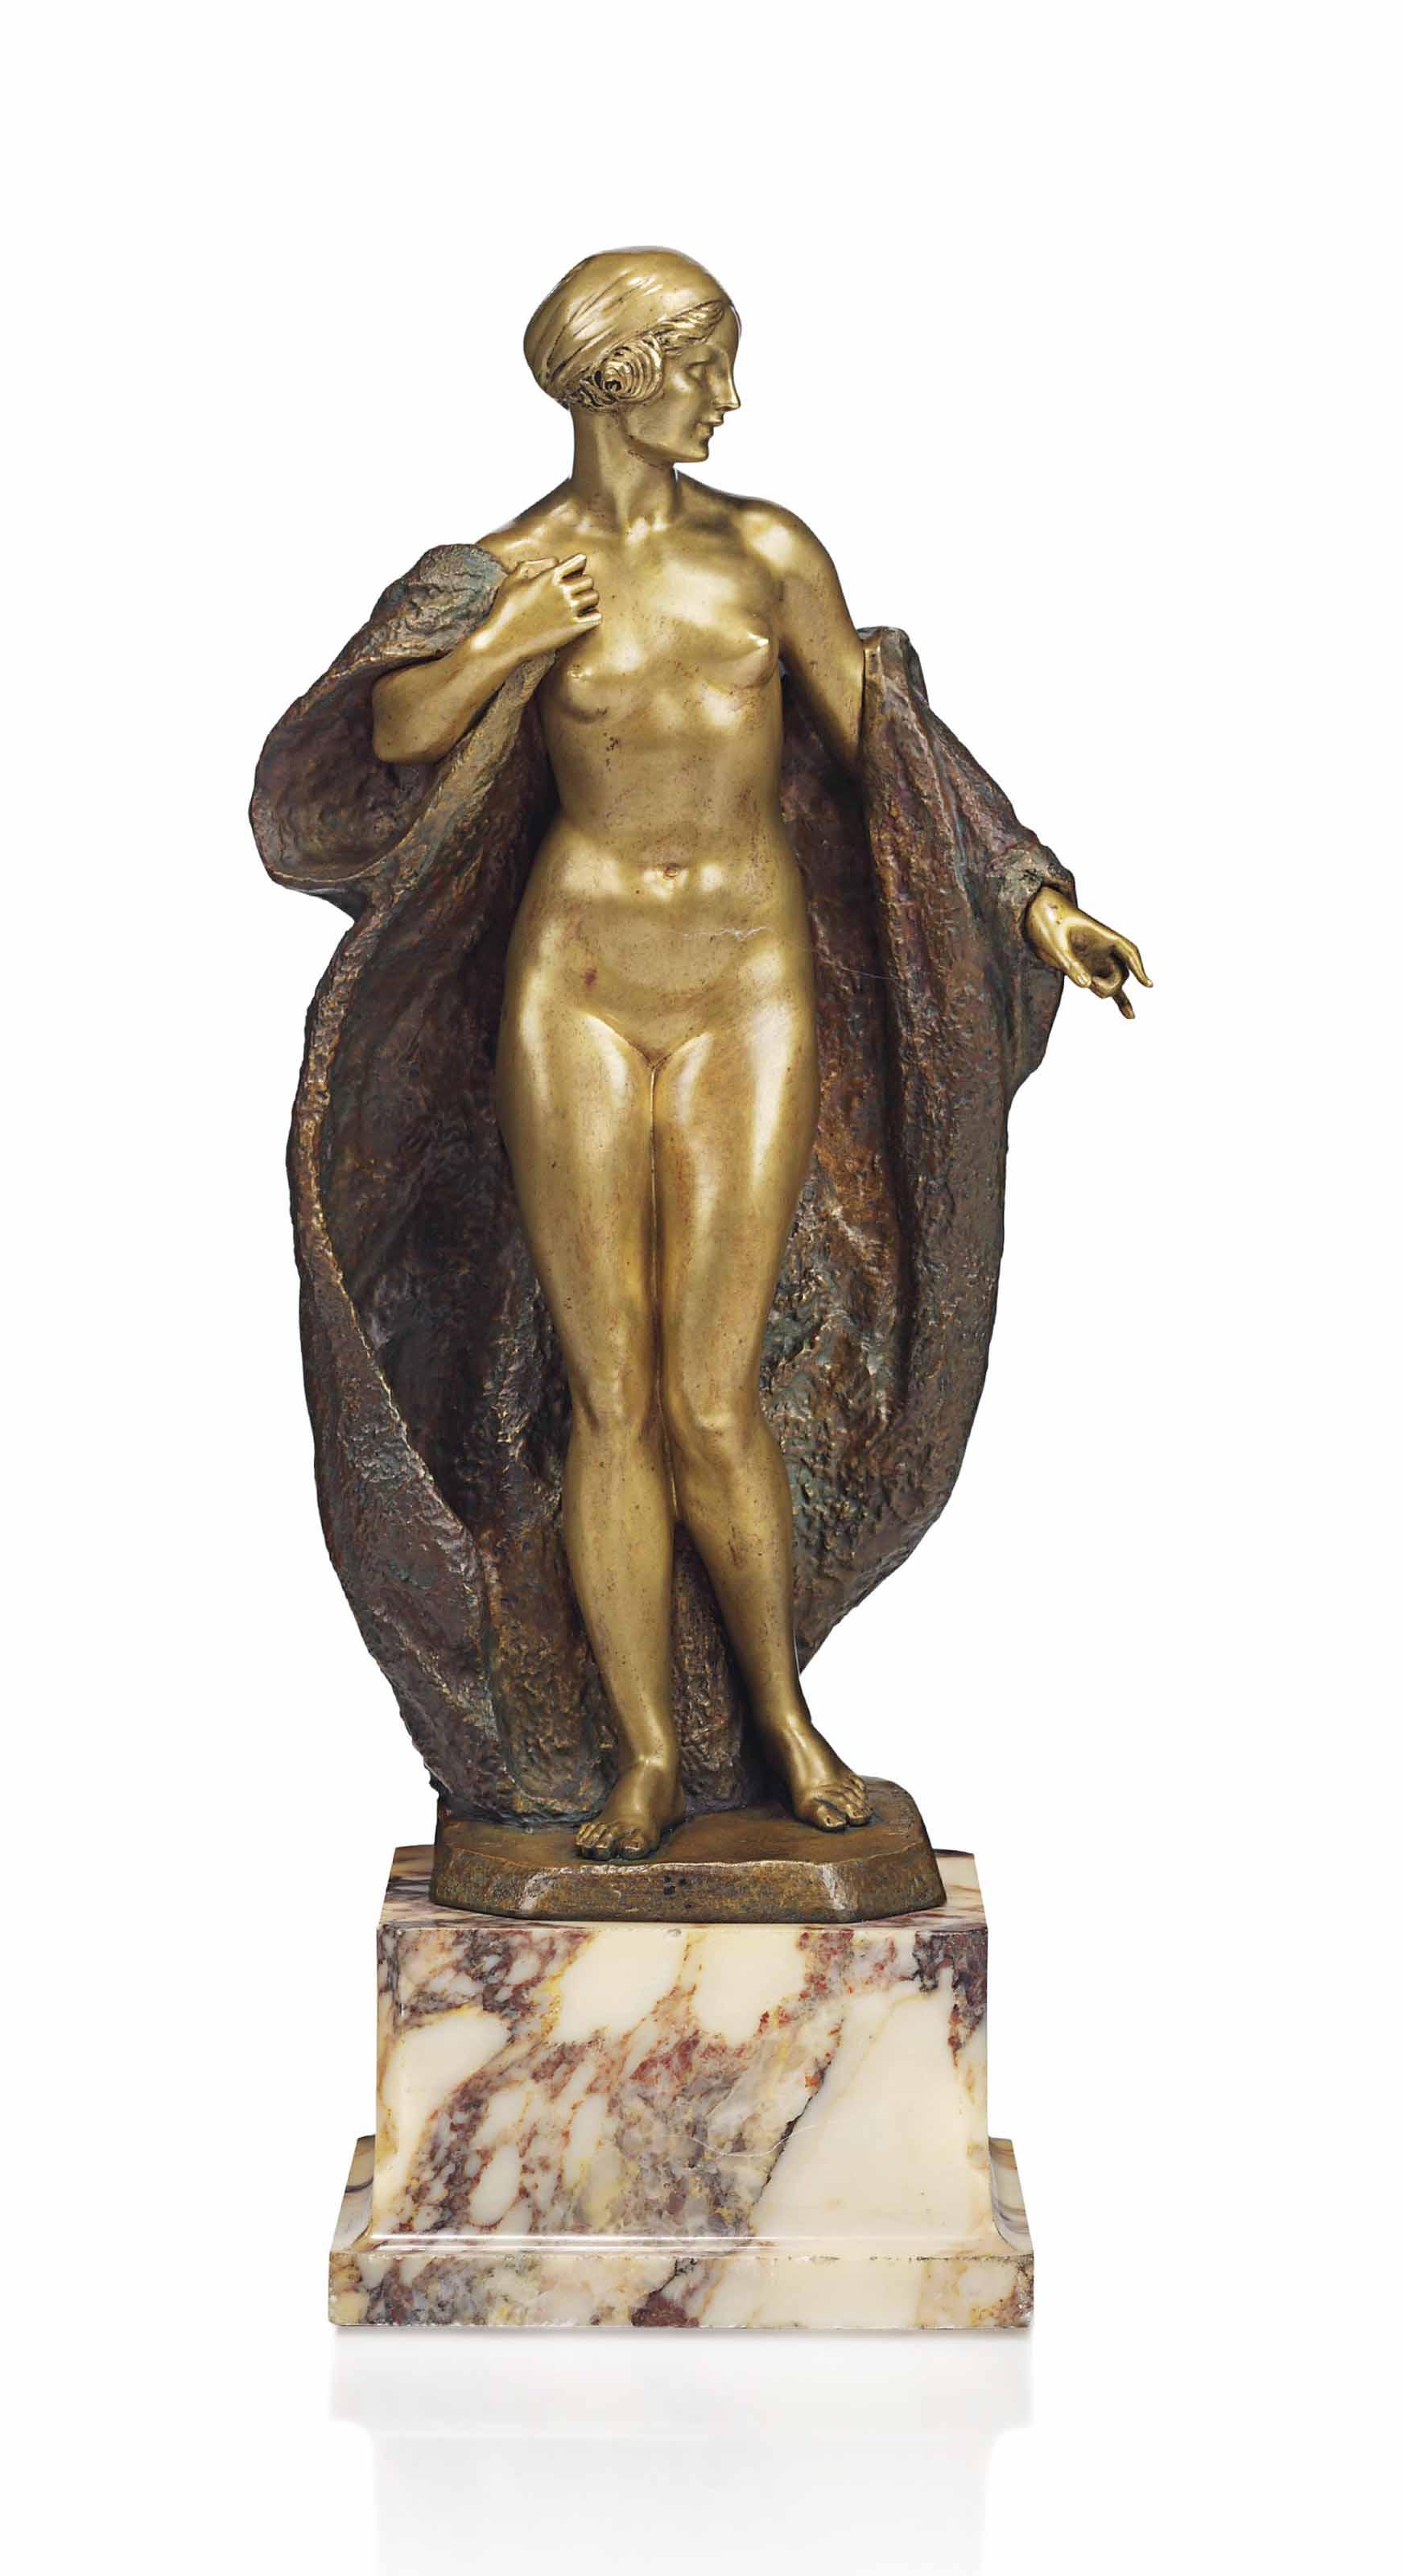 A JOE DESCOMPS (CORMIER) (1869-1950) PATINATED AND GILT BRONZE FIGURE